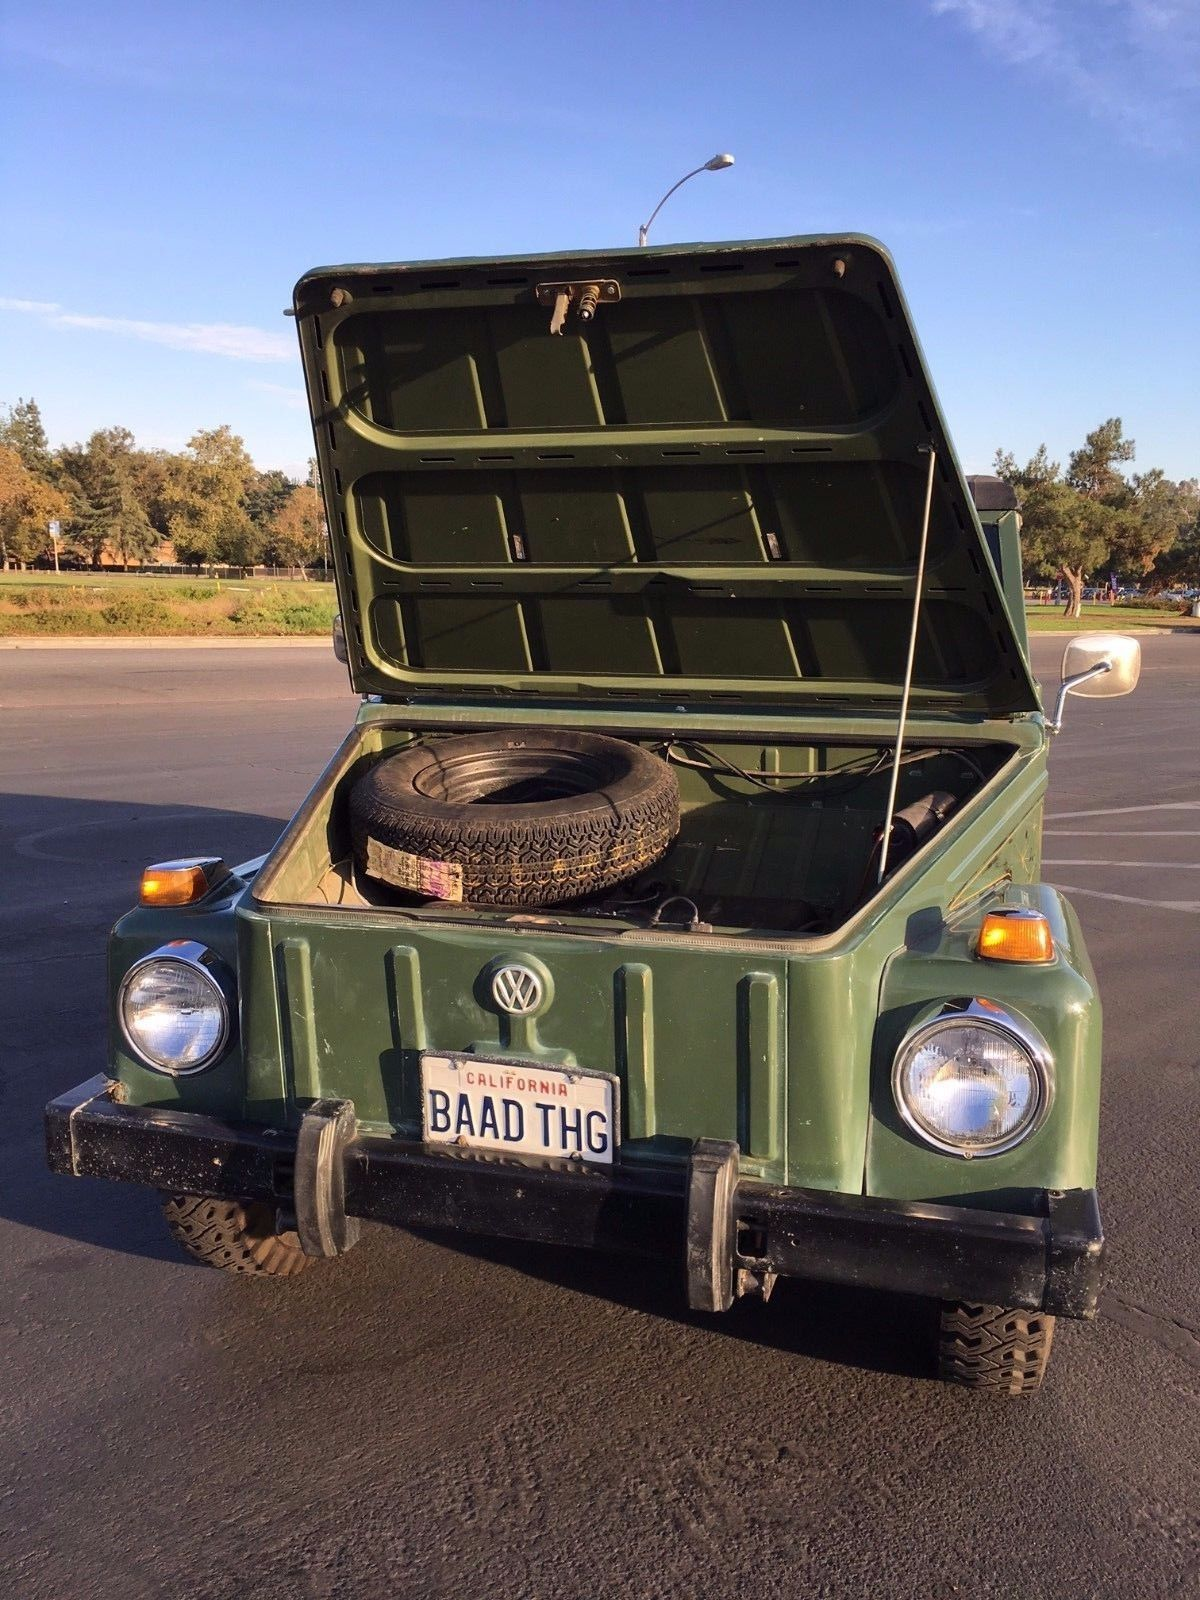 1974 Volkswagen Thing under the hood